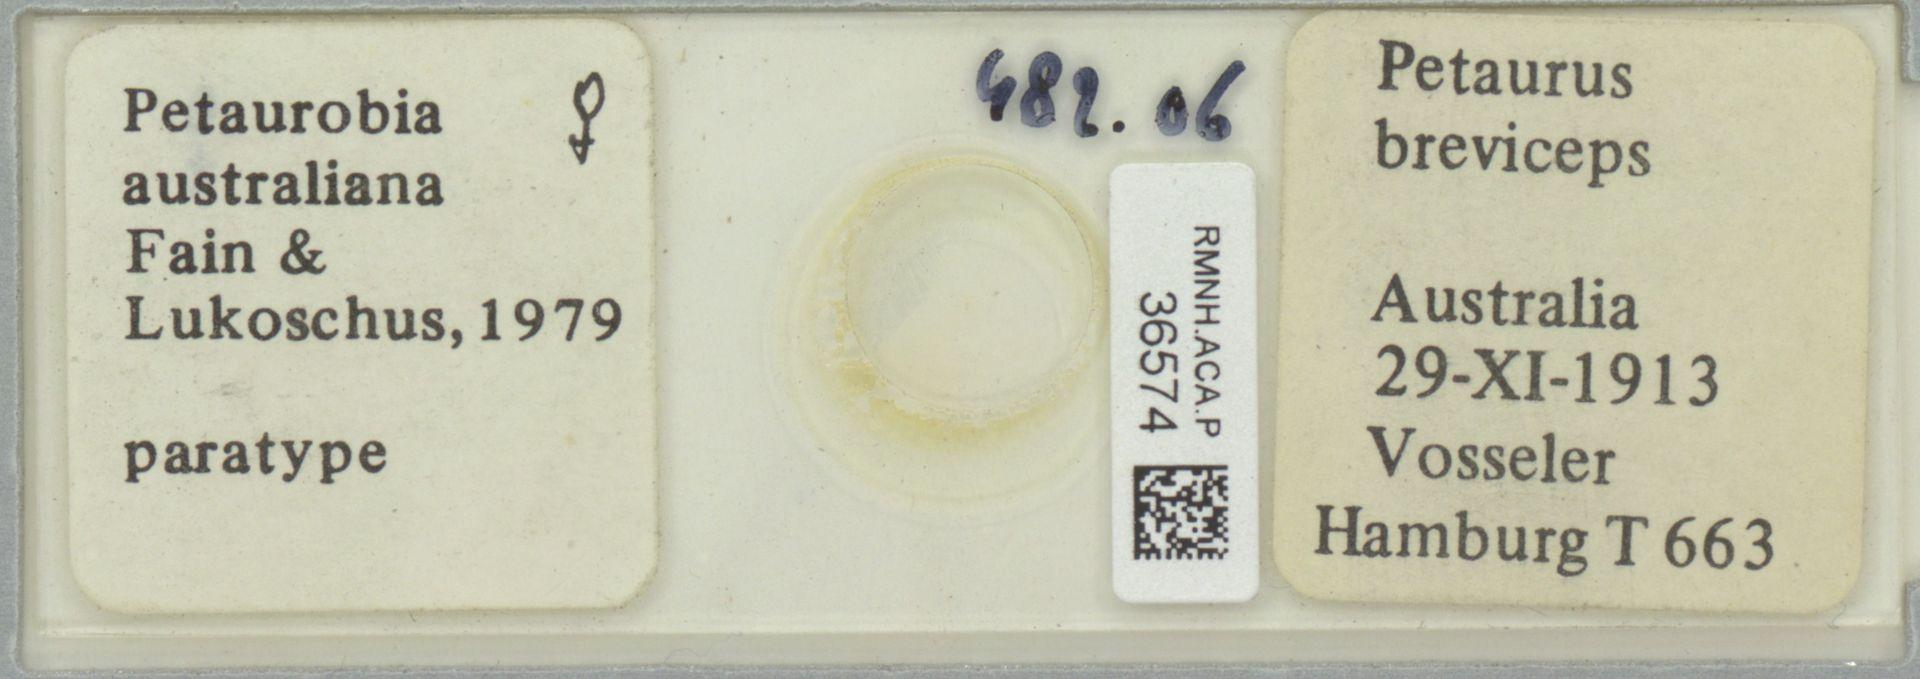 RMNH.ACA.P.36574 | Petaurobia australiana Fain & Lukoschus, 1979